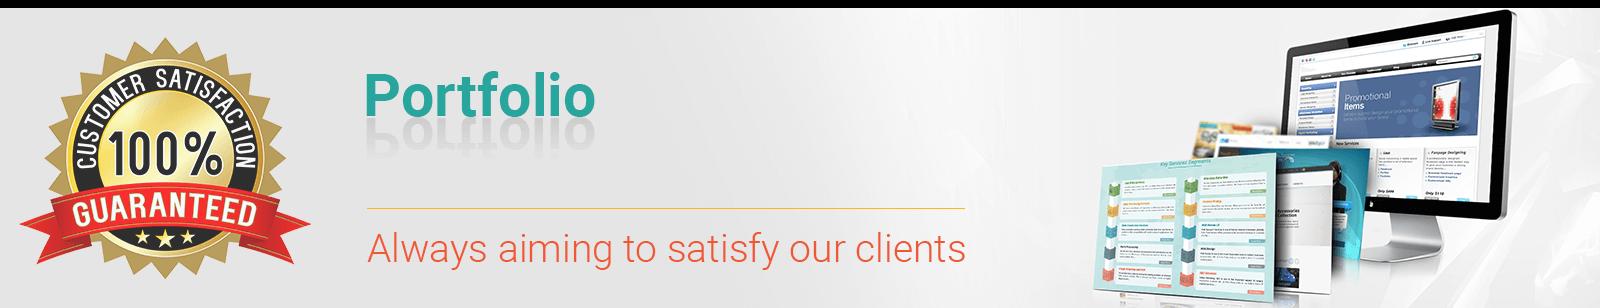 data-service-banner